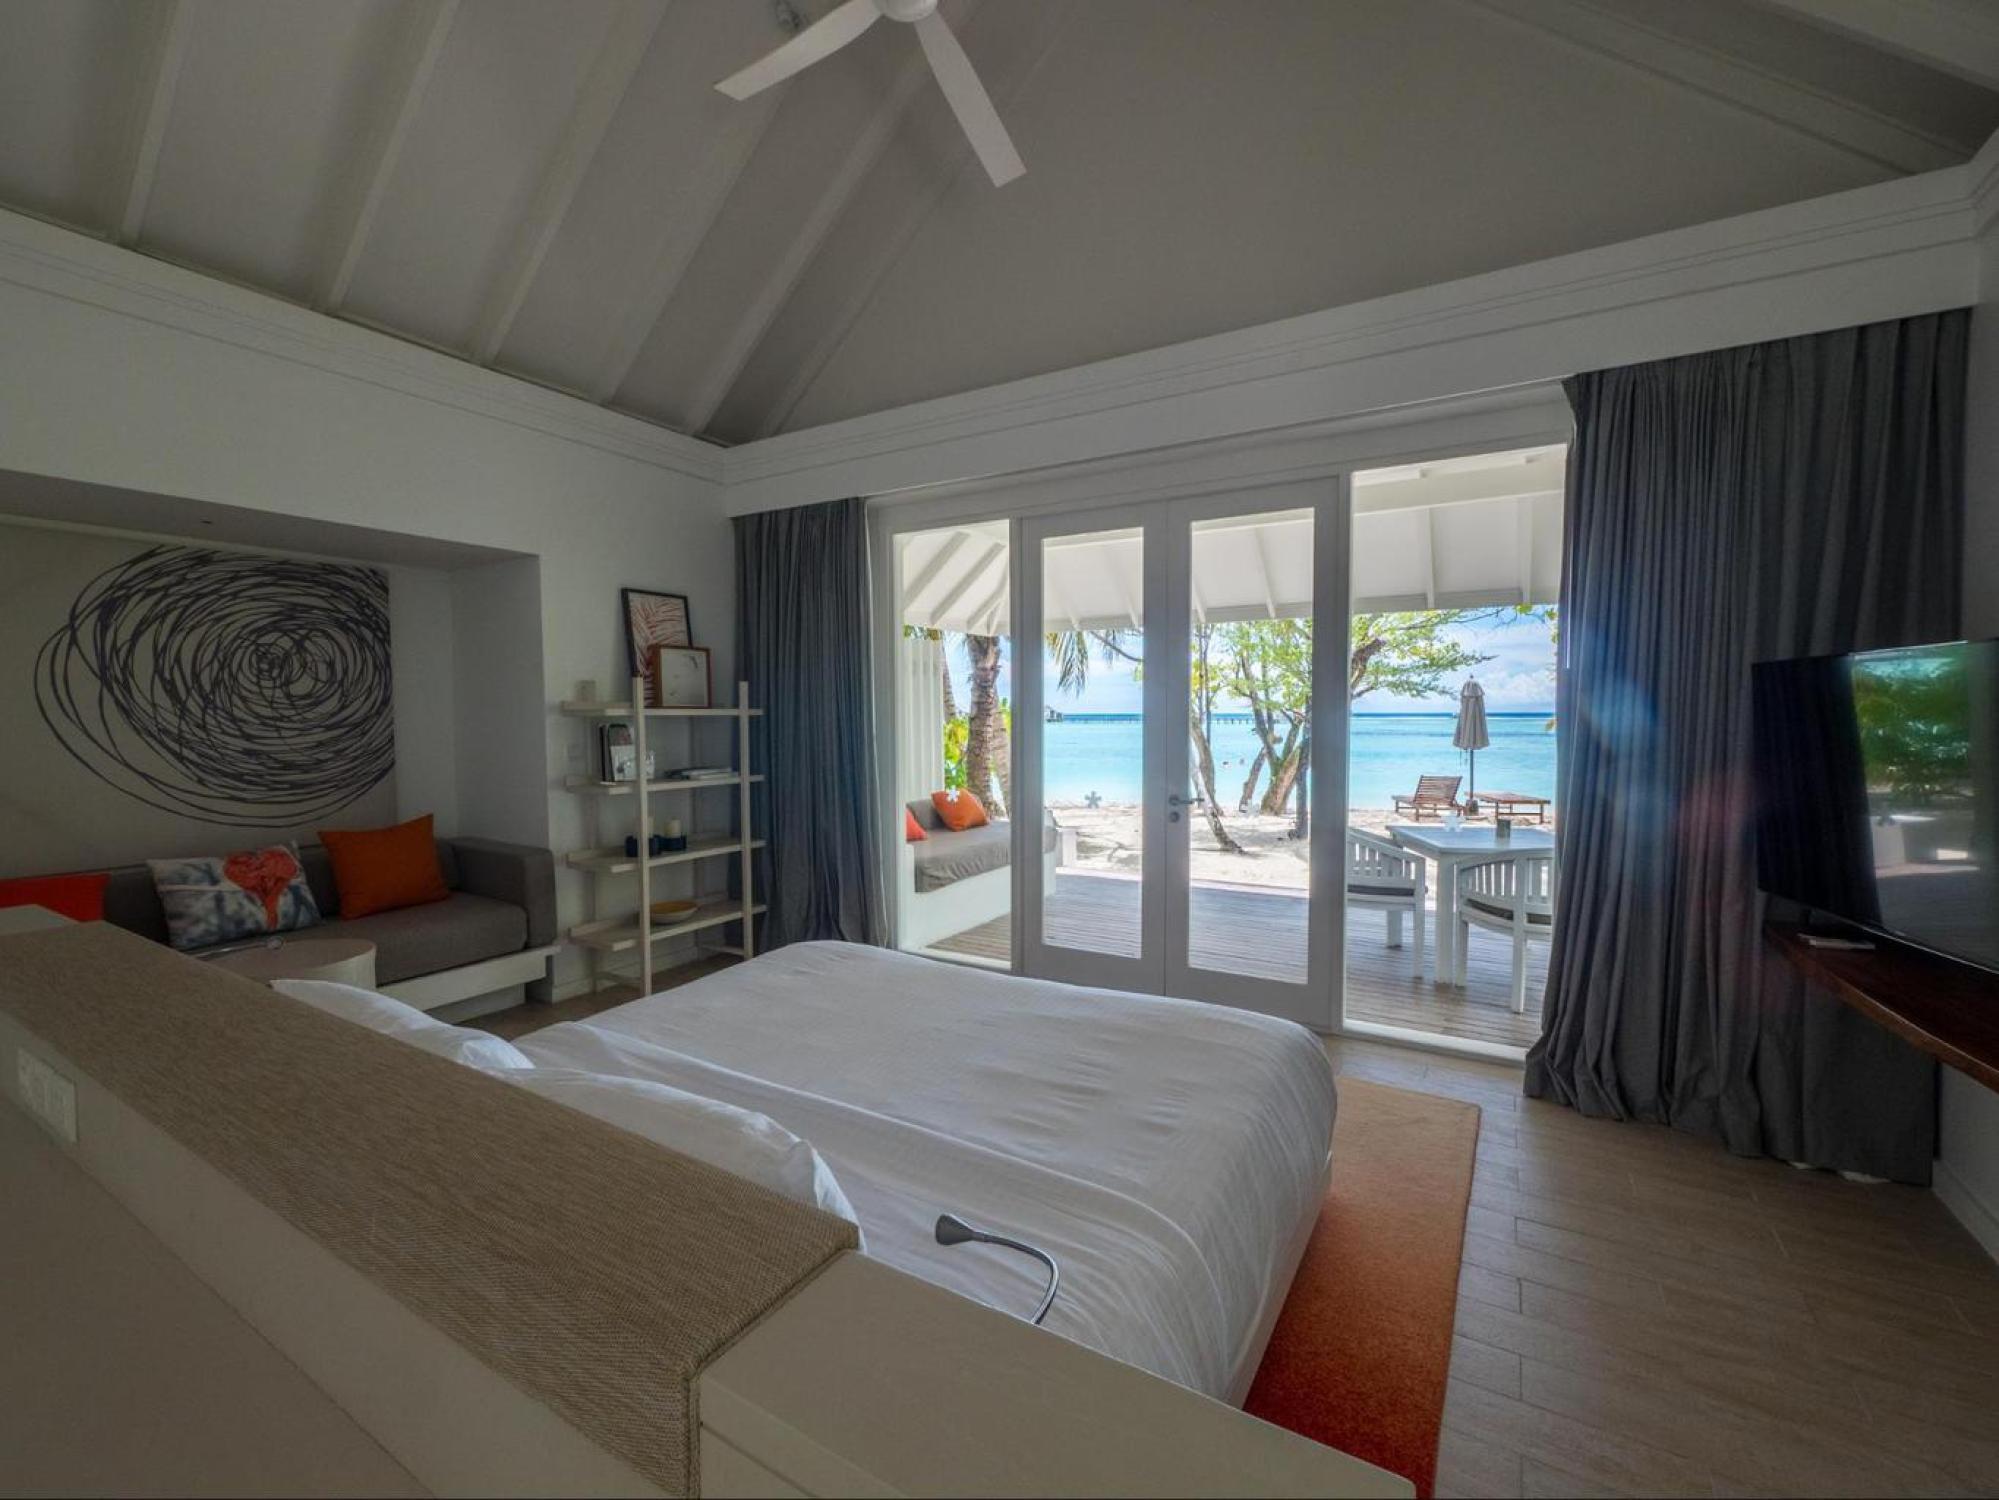 Beach villa at LUX* Maldives South Ari Atoll